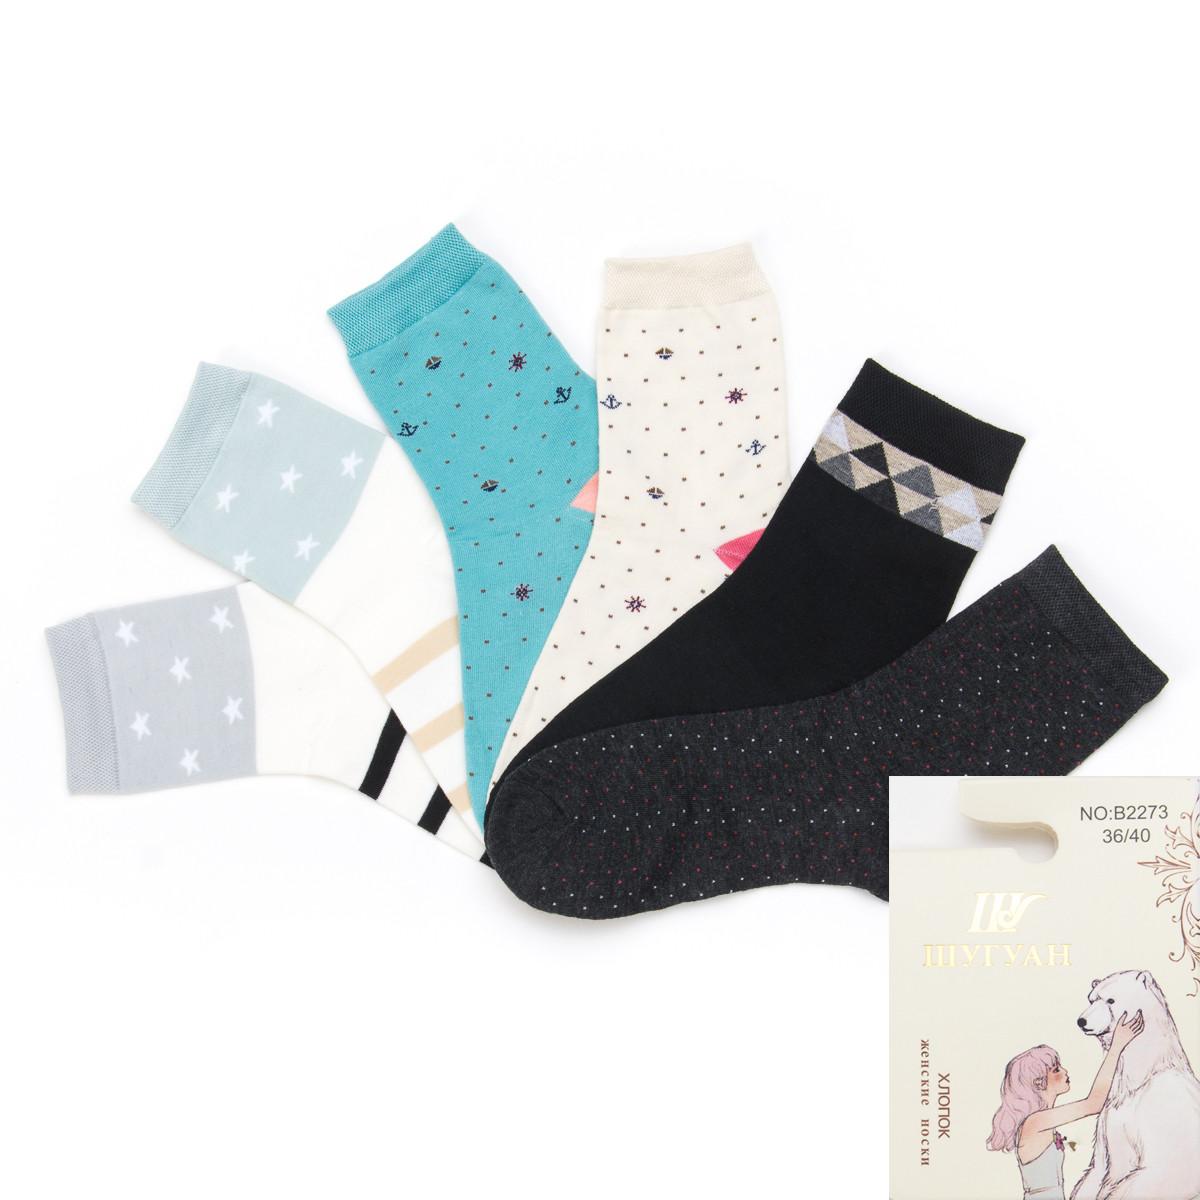 Носки женские с различными узорами Шугуан В2273